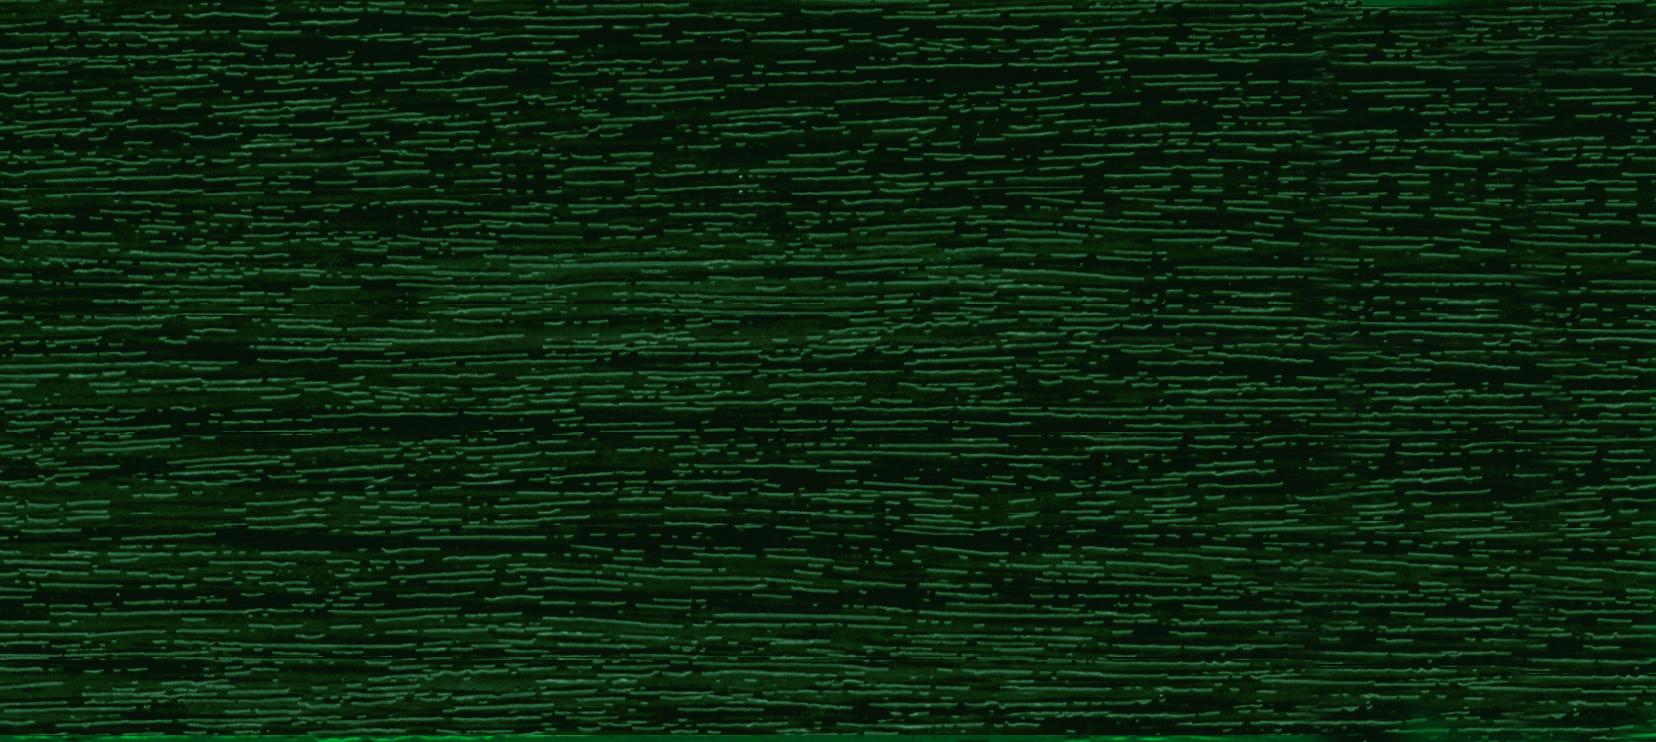 Deko_RAL_6009_Tannengrün.jpg